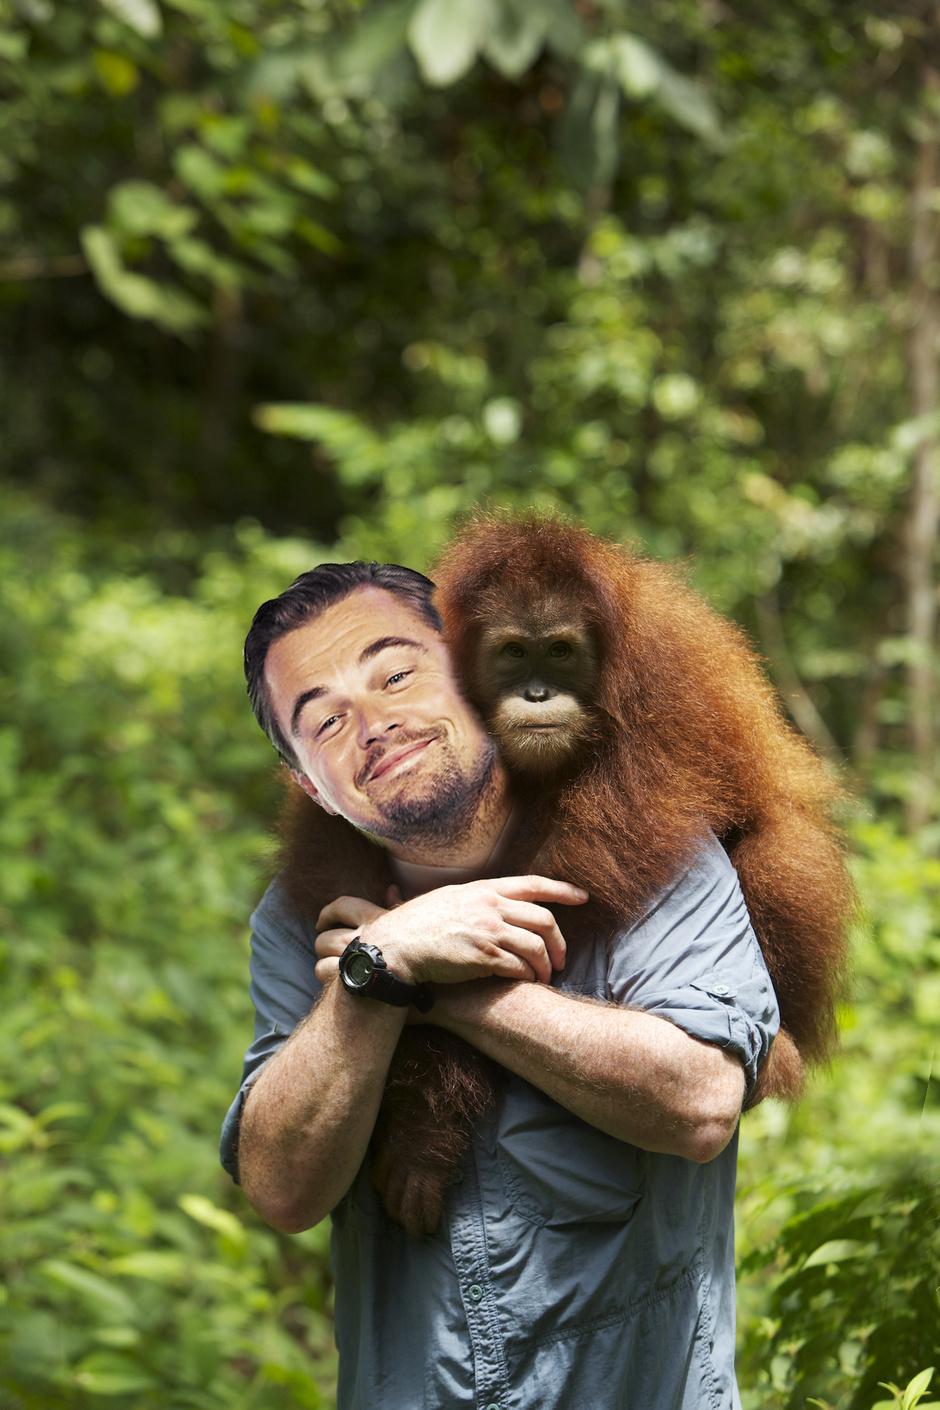 Леонардо Ди Каприо повстречался с орангутангом на острове Суматра